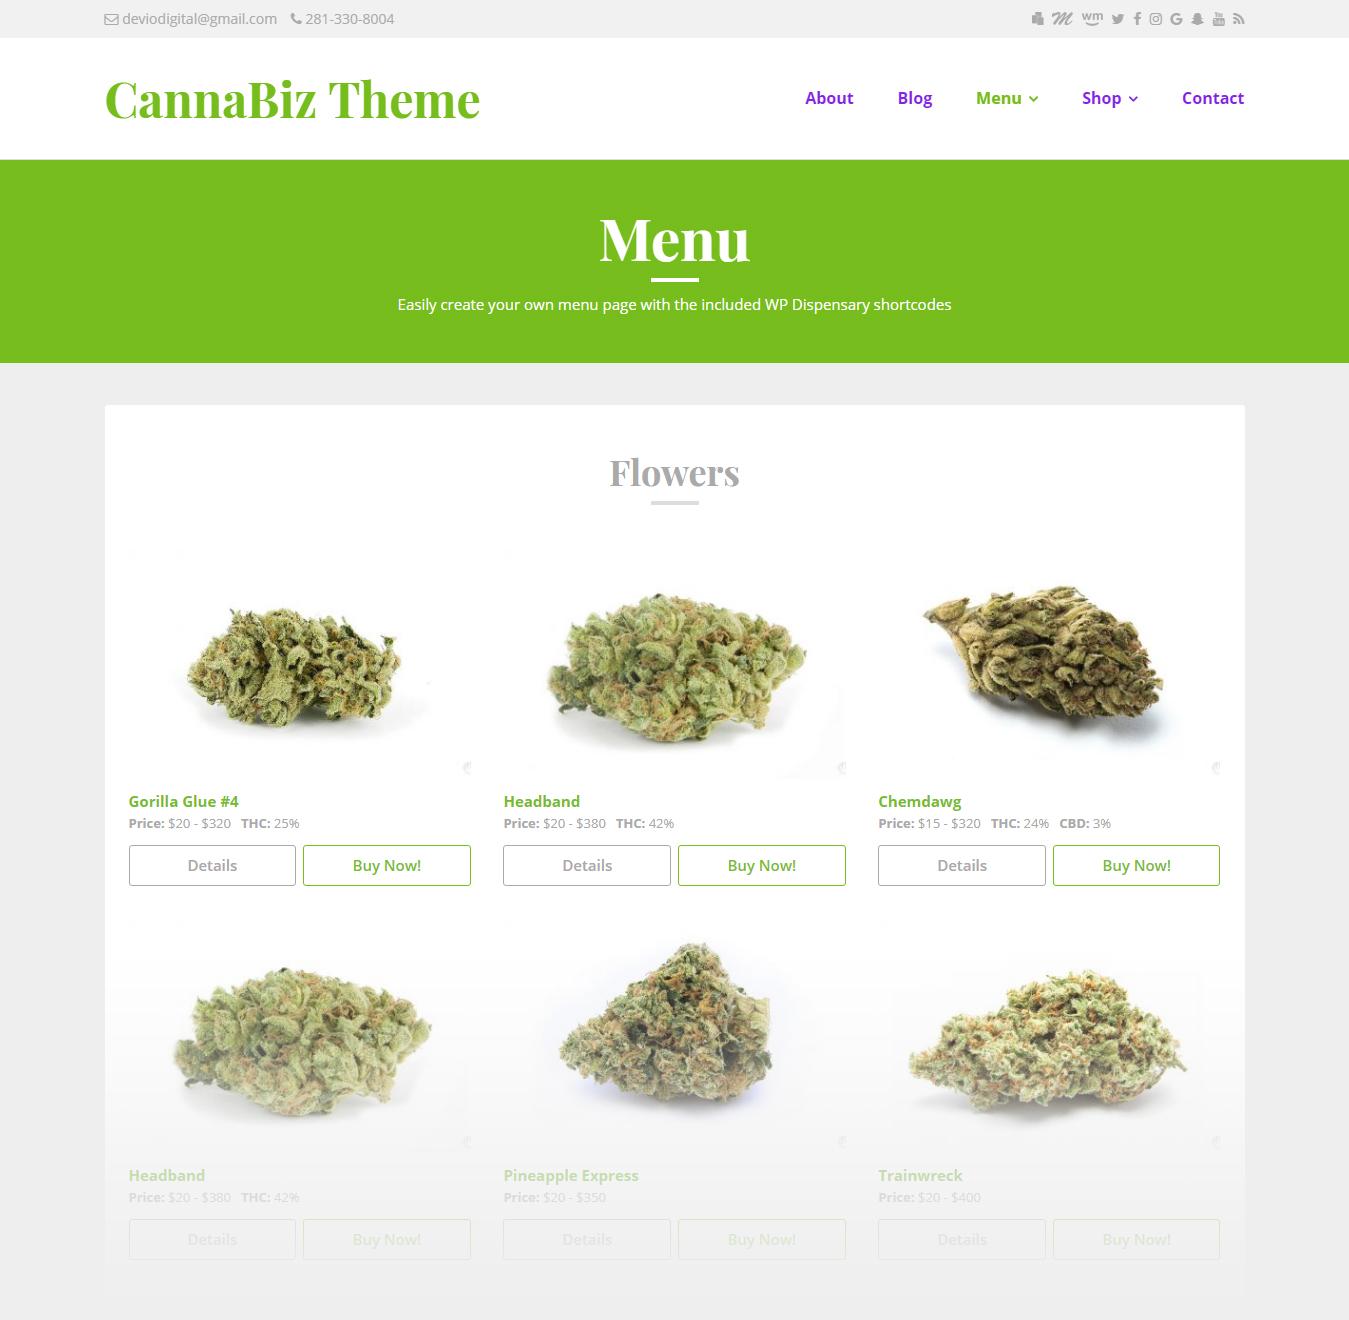 CannaBiz theme for WordPress